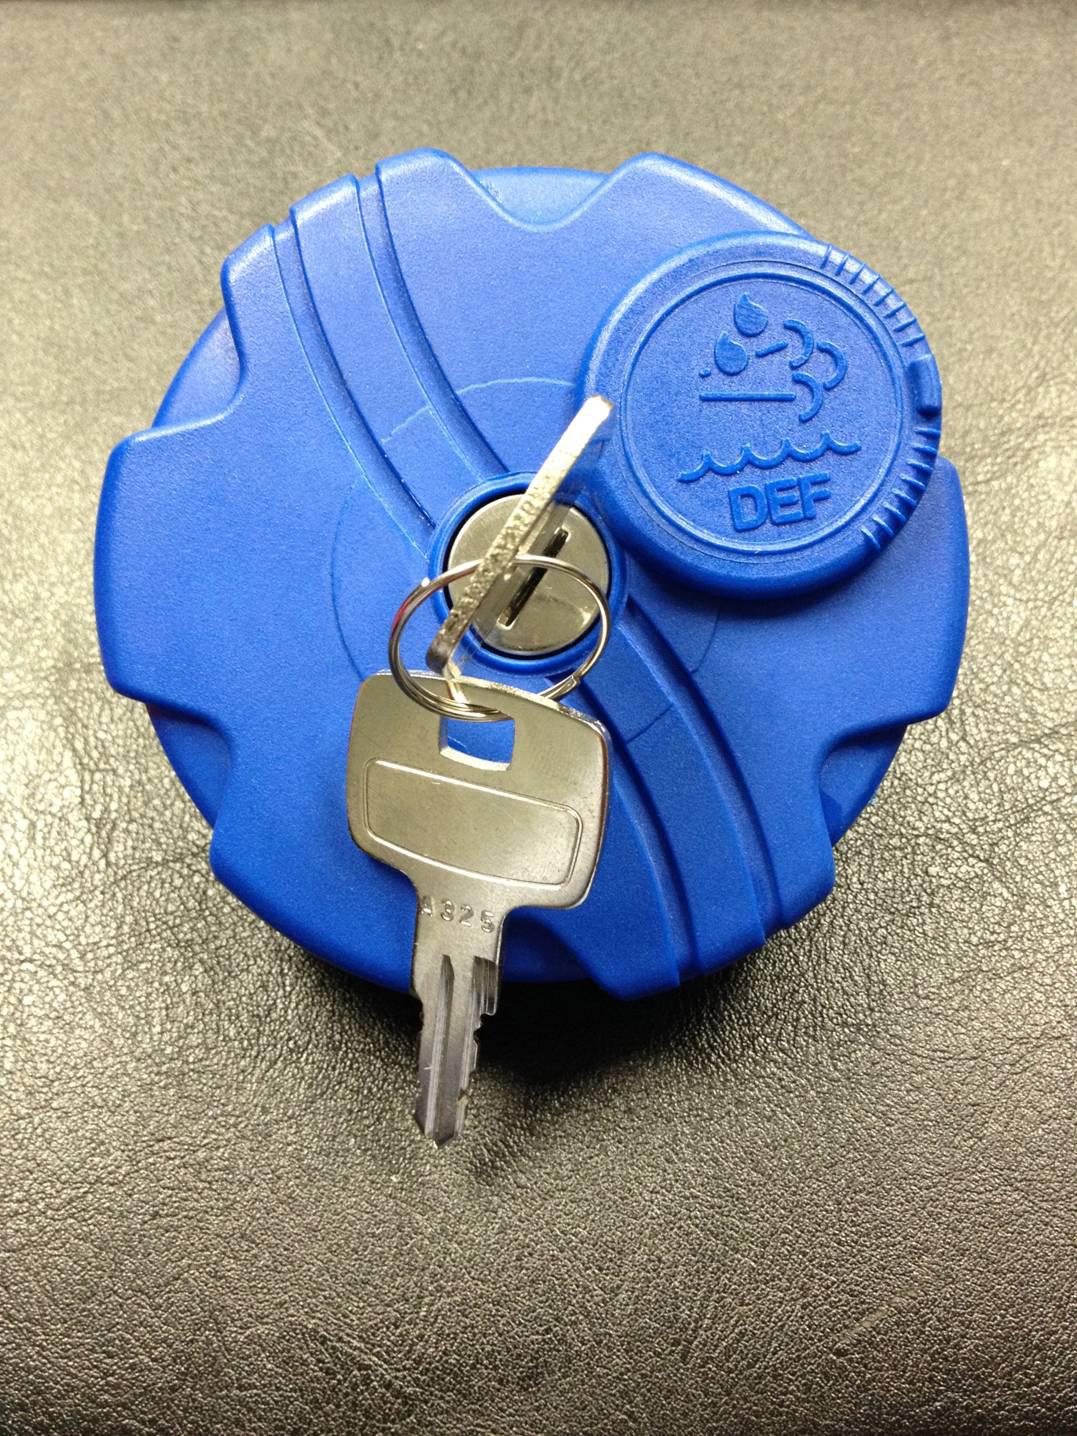 FuelDefend Prevents Fuel Theft, DEF Contamination